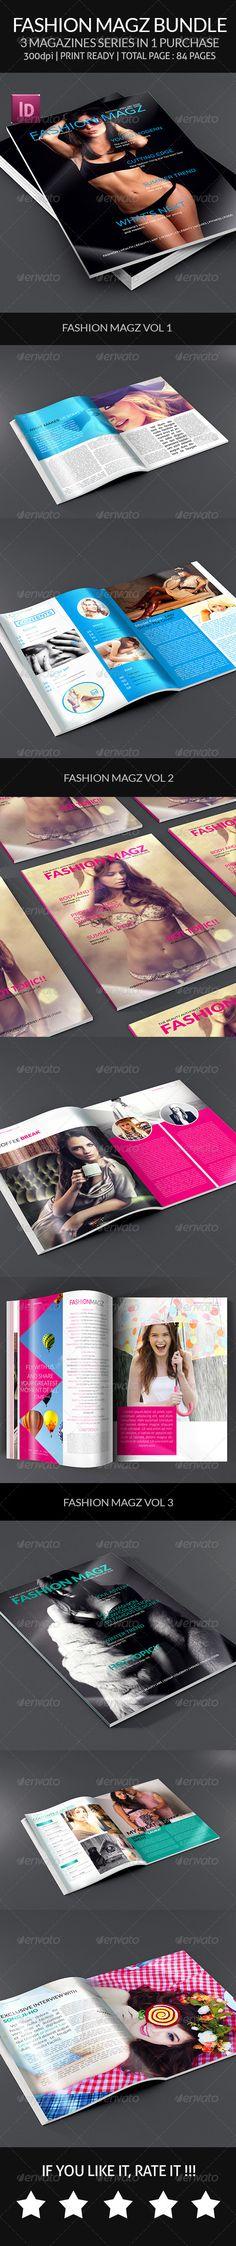 Fashion Magz Bundle - Indesign Magazine - #Magazines Print #Templates Download here: https://graphicriver.net/item/fashion-magz-bundle-indesign-magazine/8188832?ref=alena994